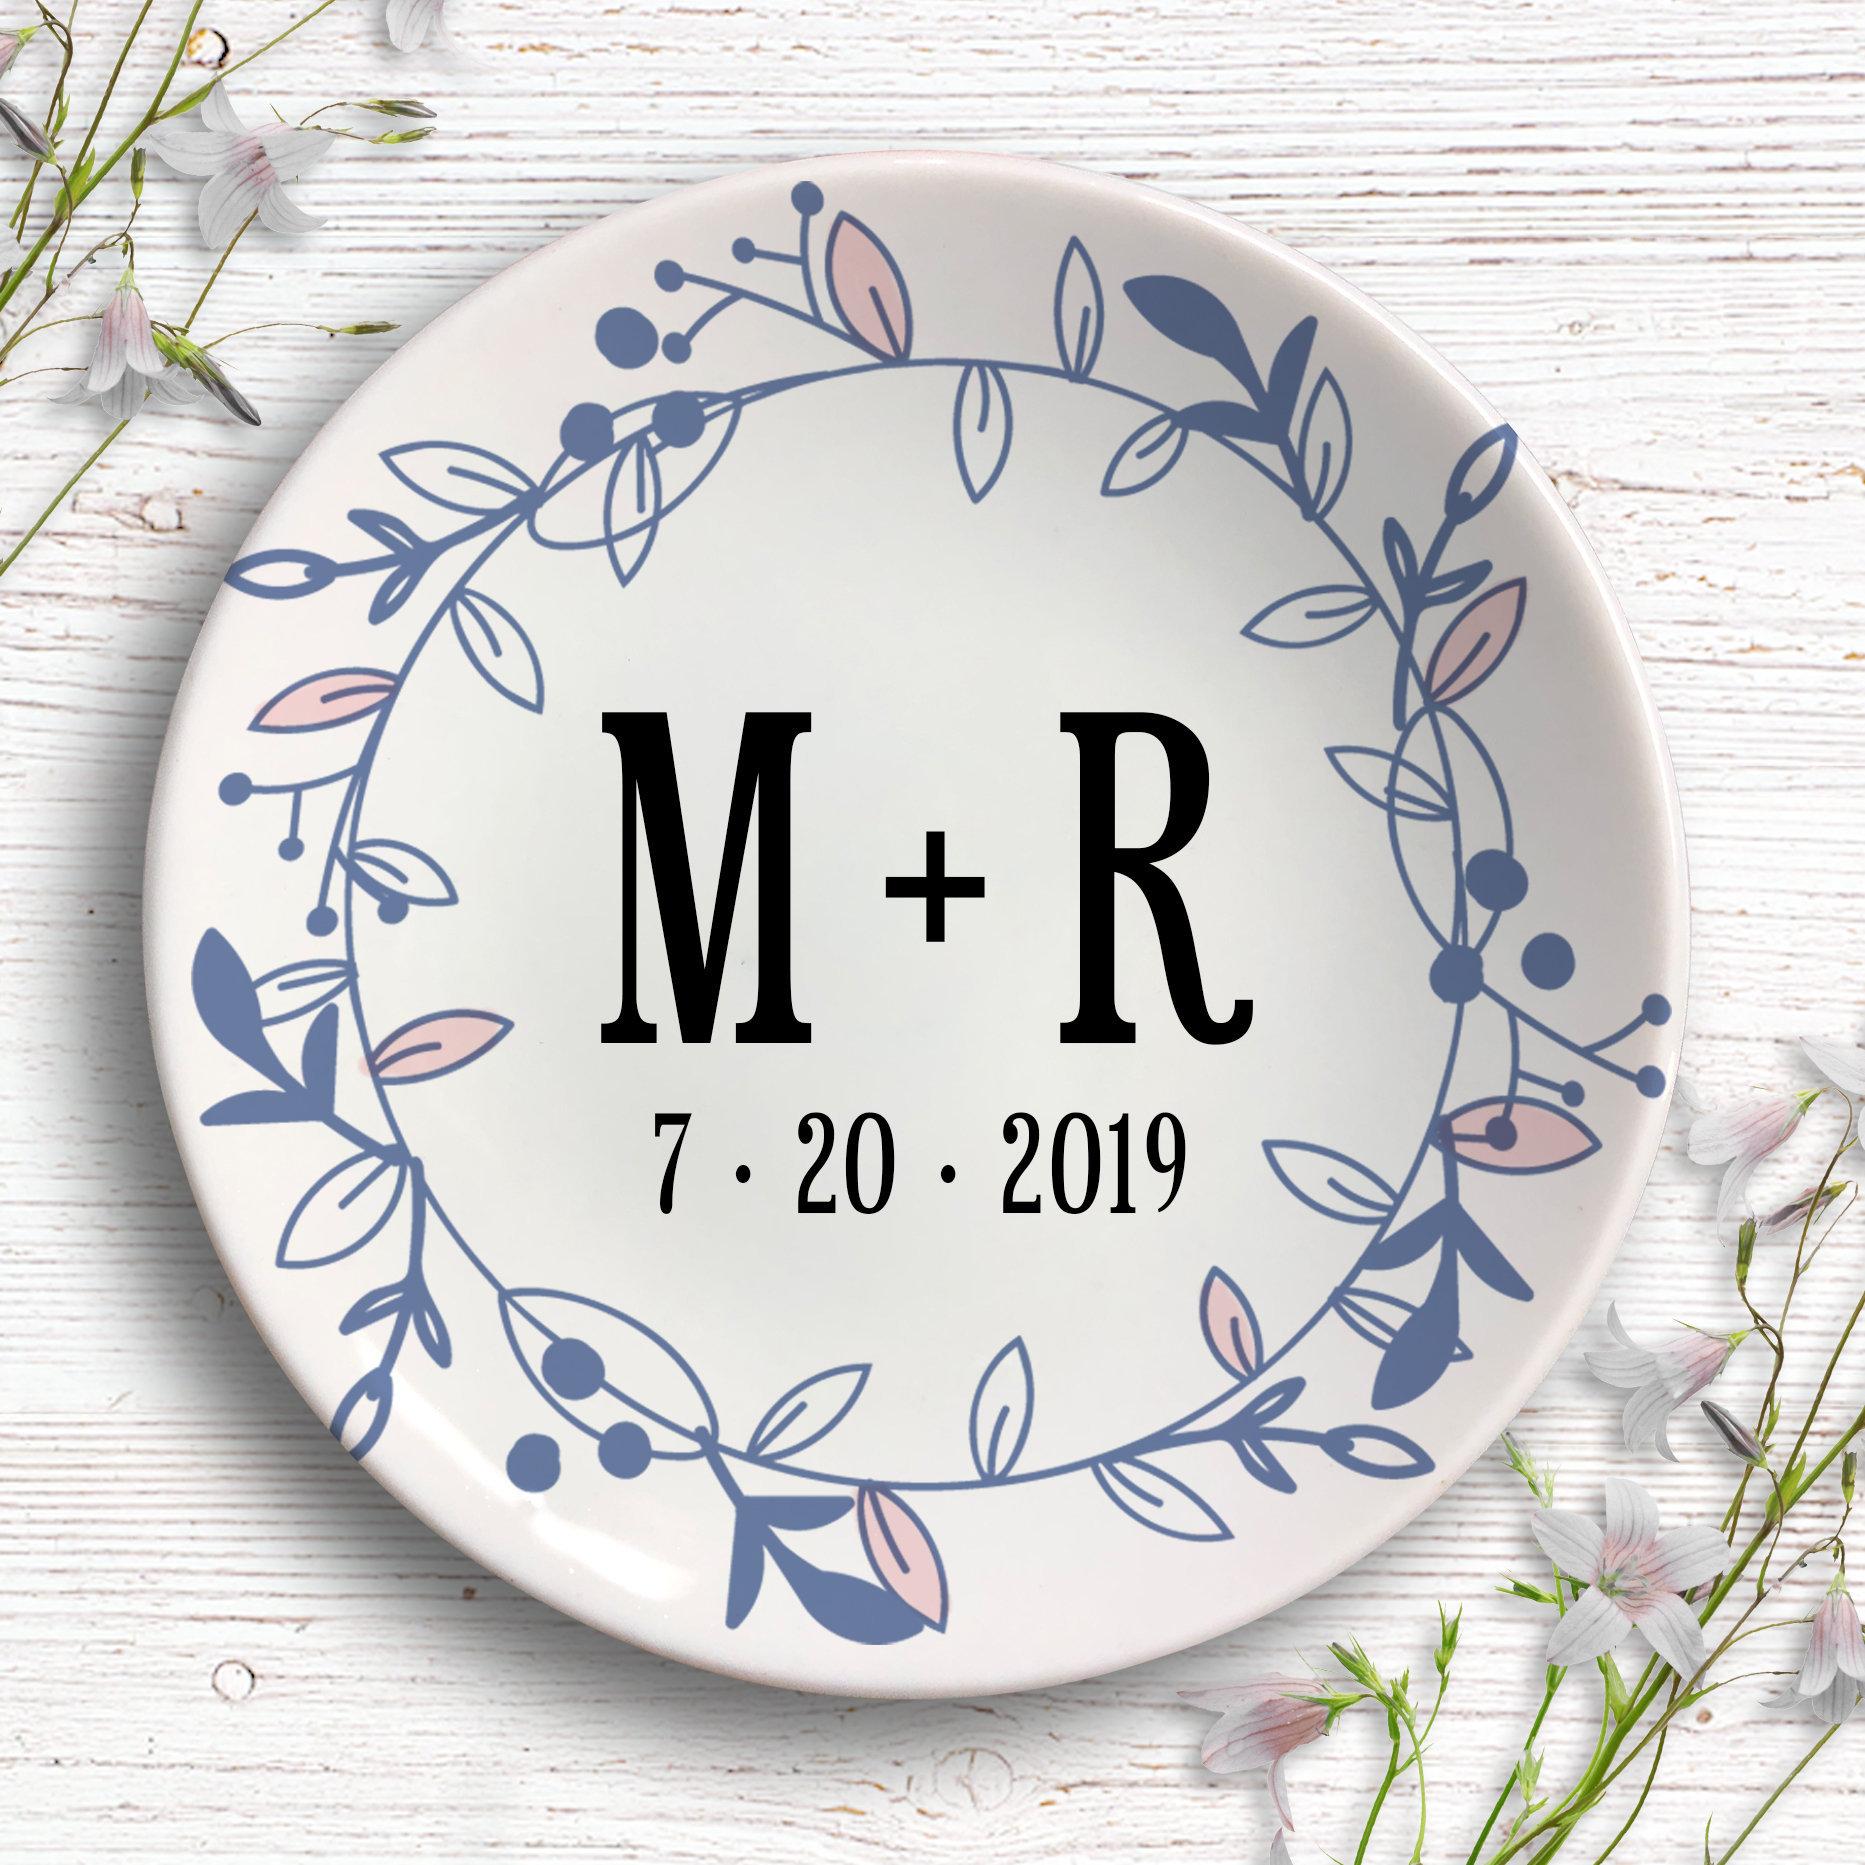 eb636e72e Personalized Wedding Ring Dish - Wedding Gift - Engagement Gift Ring Holder  - Jewelry Dish - Jewelry storage - Bridal Shower Gift - Trinket